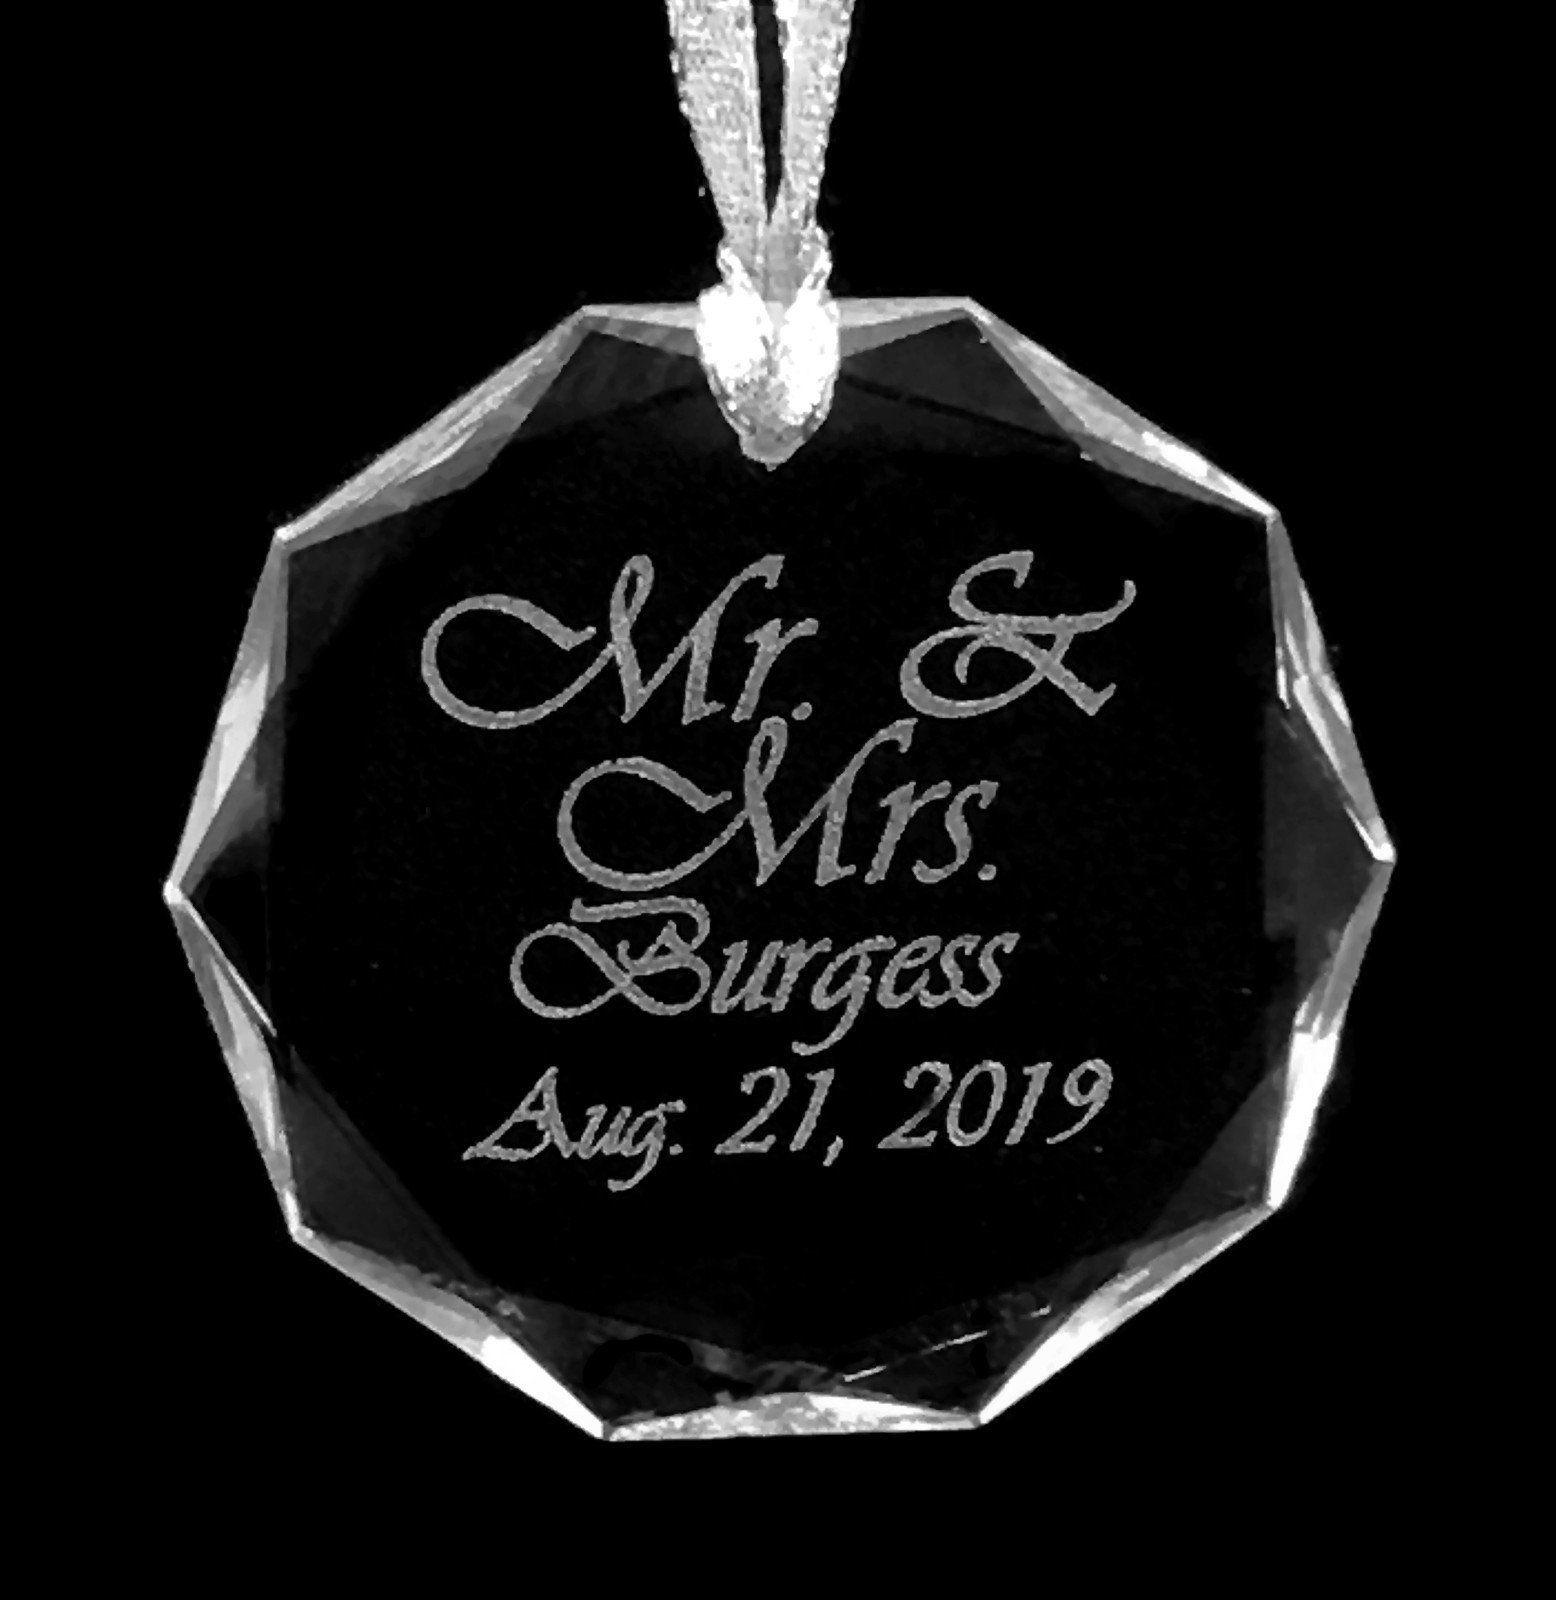 Custom Engraved Crystal Ornament, Personalized, Birthday